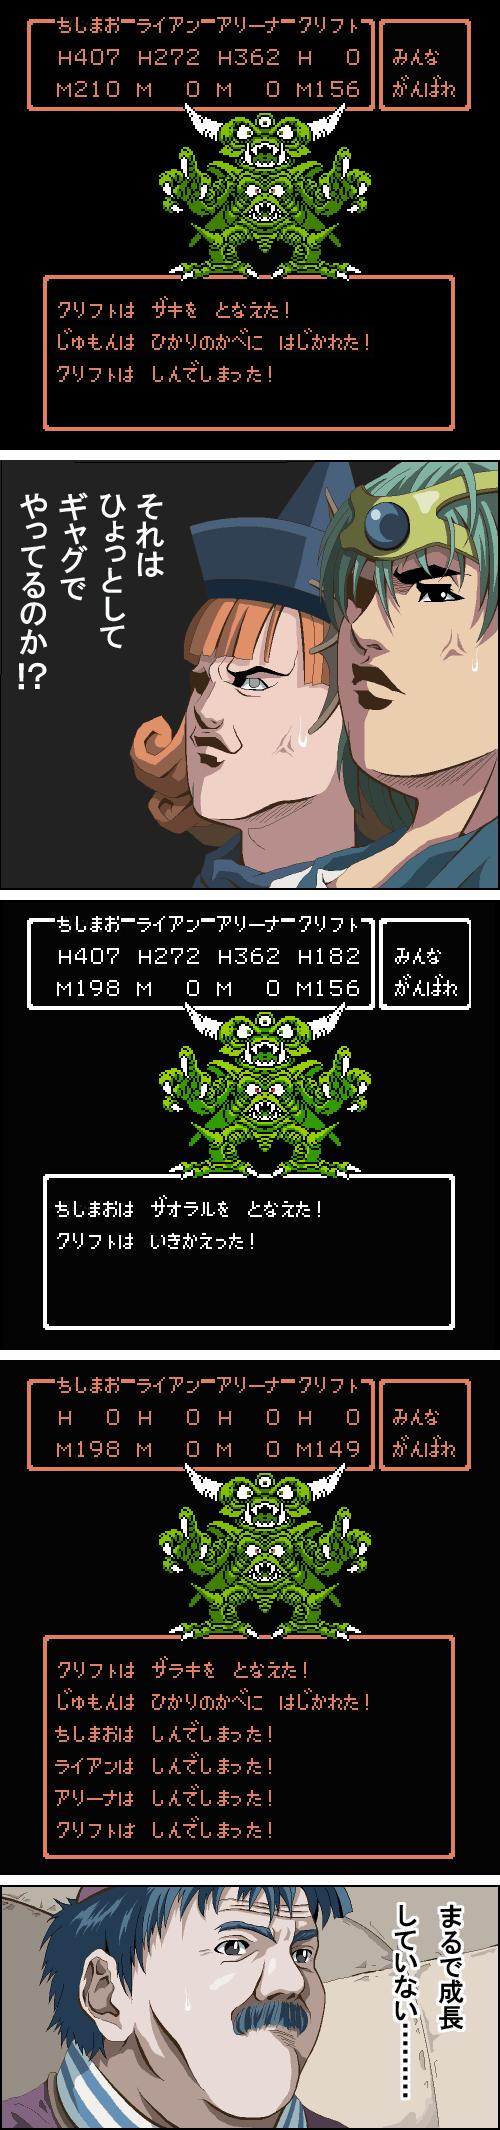 dqsdqf078